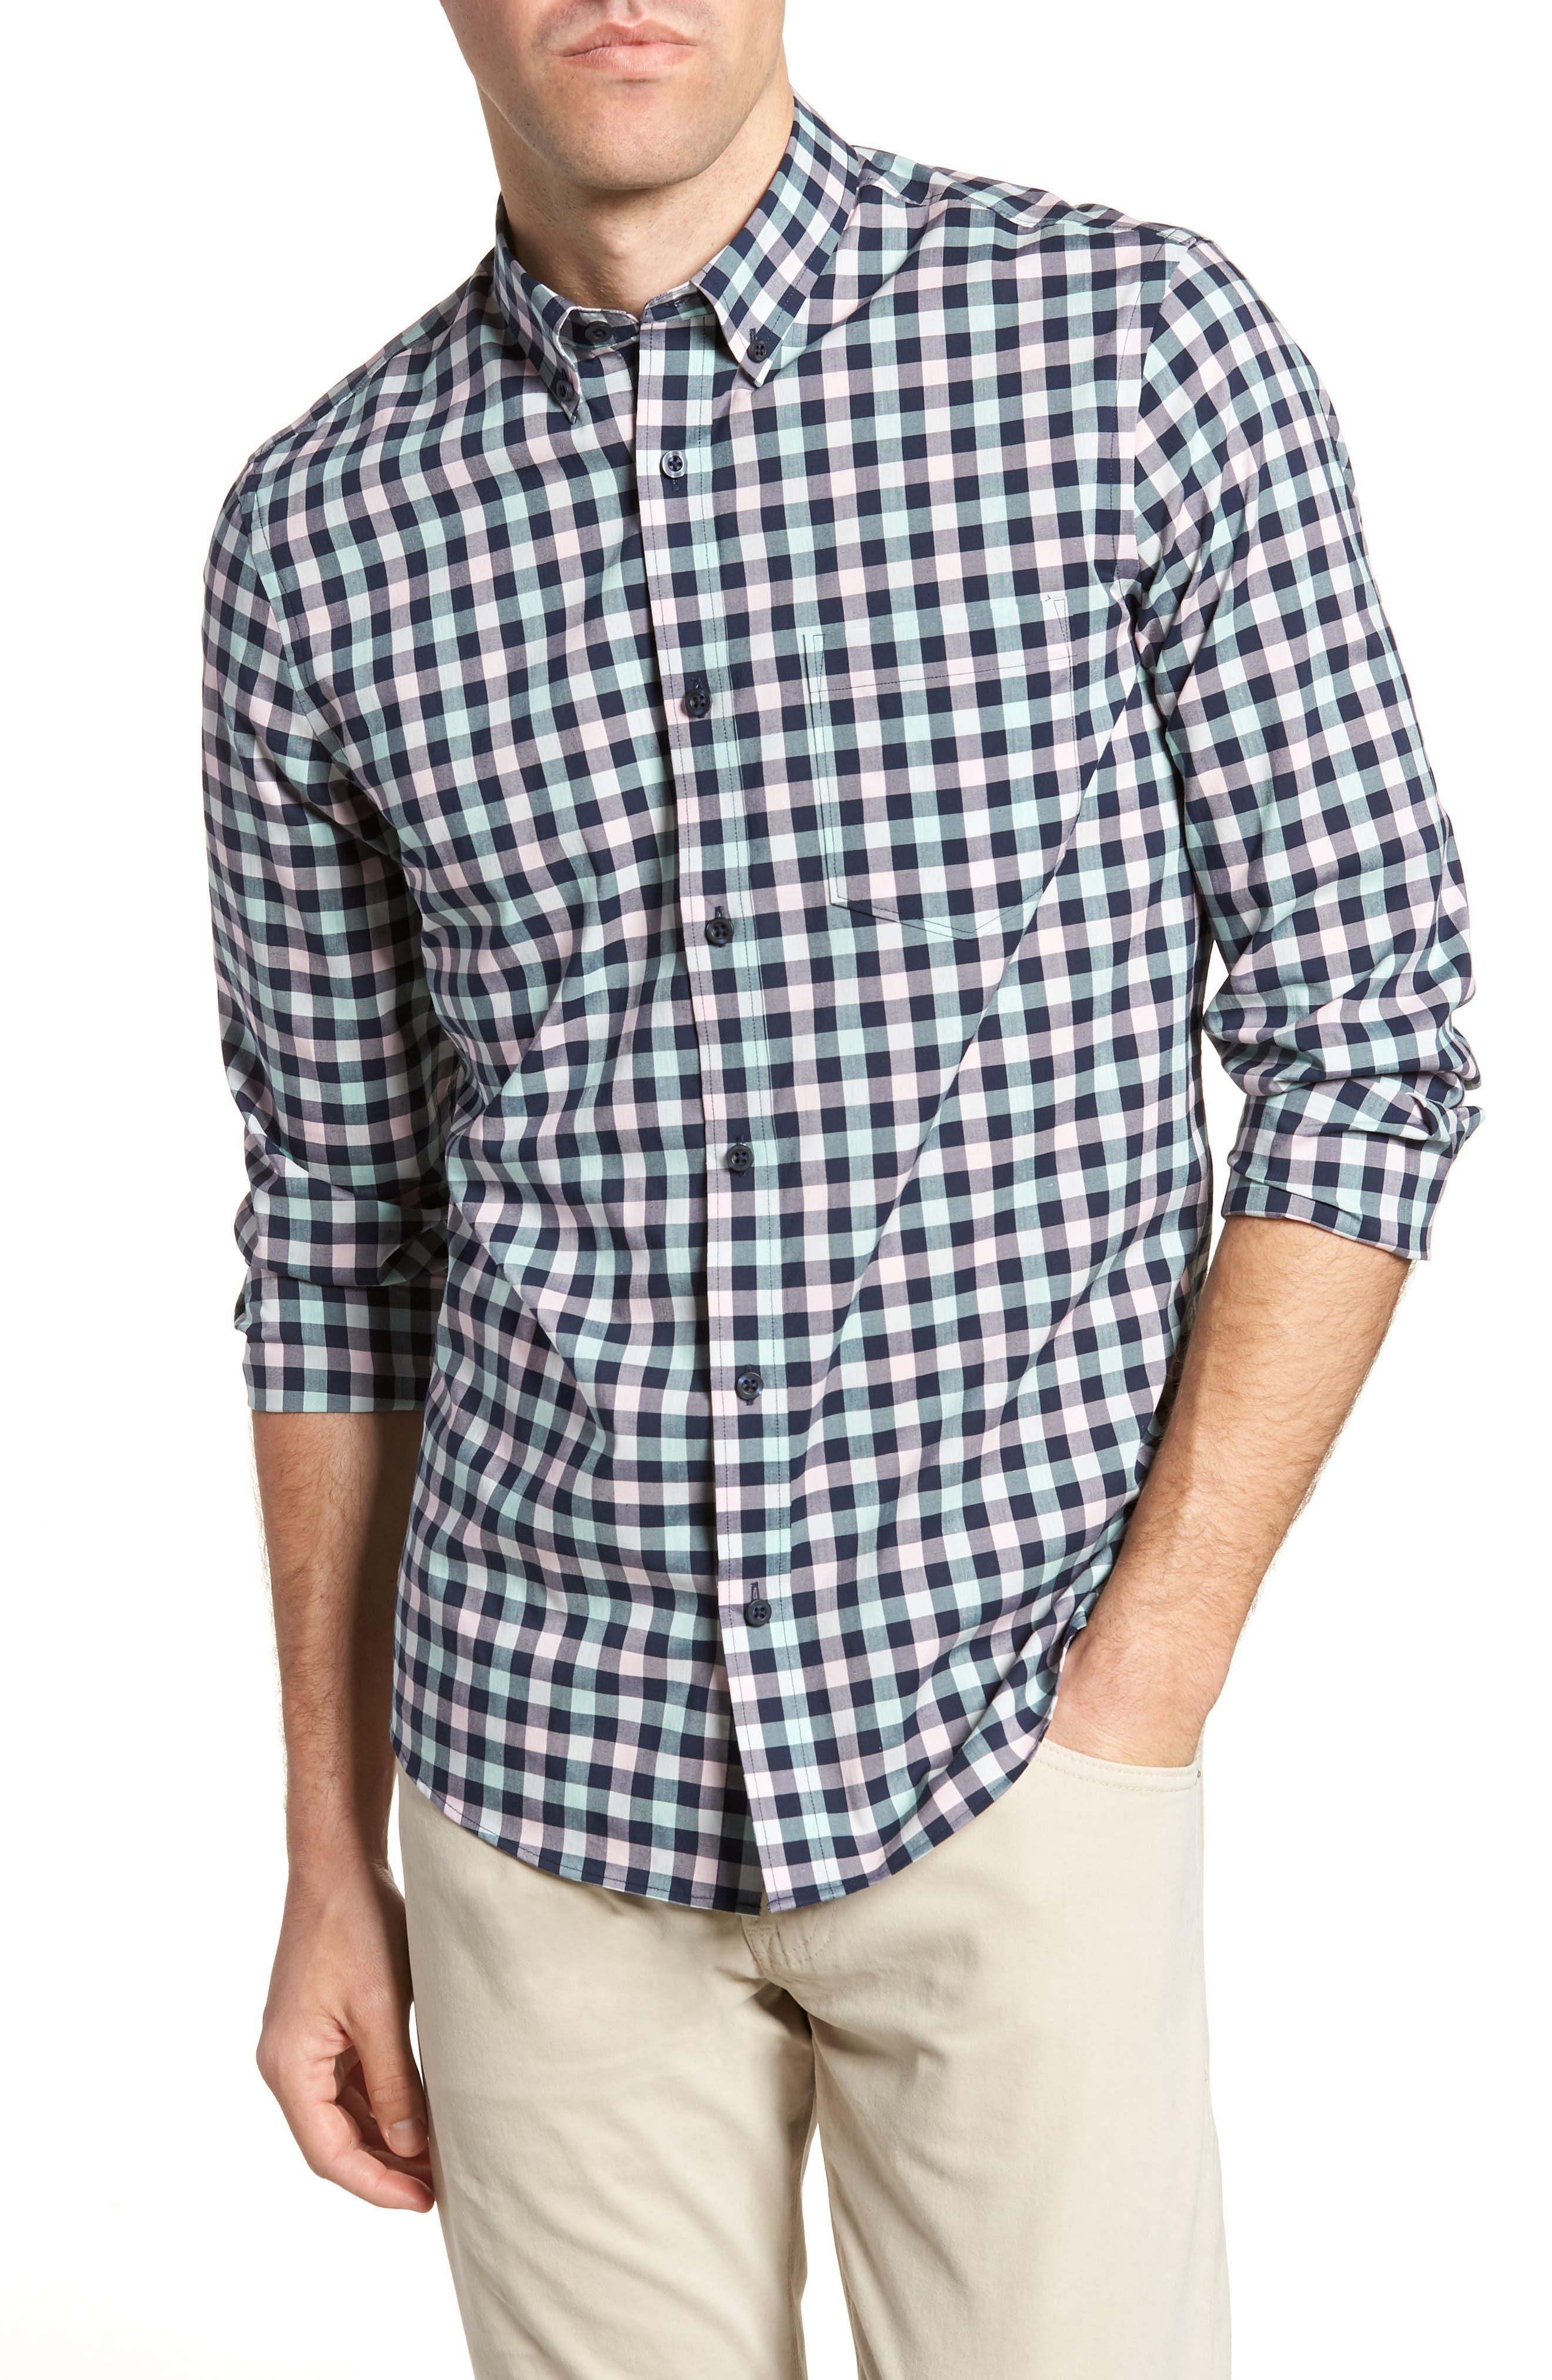 Tech-Smart Trim Fit Check Sport Shirt,                             Main thumbnail 1, color,                             Navy Iris Teal Check